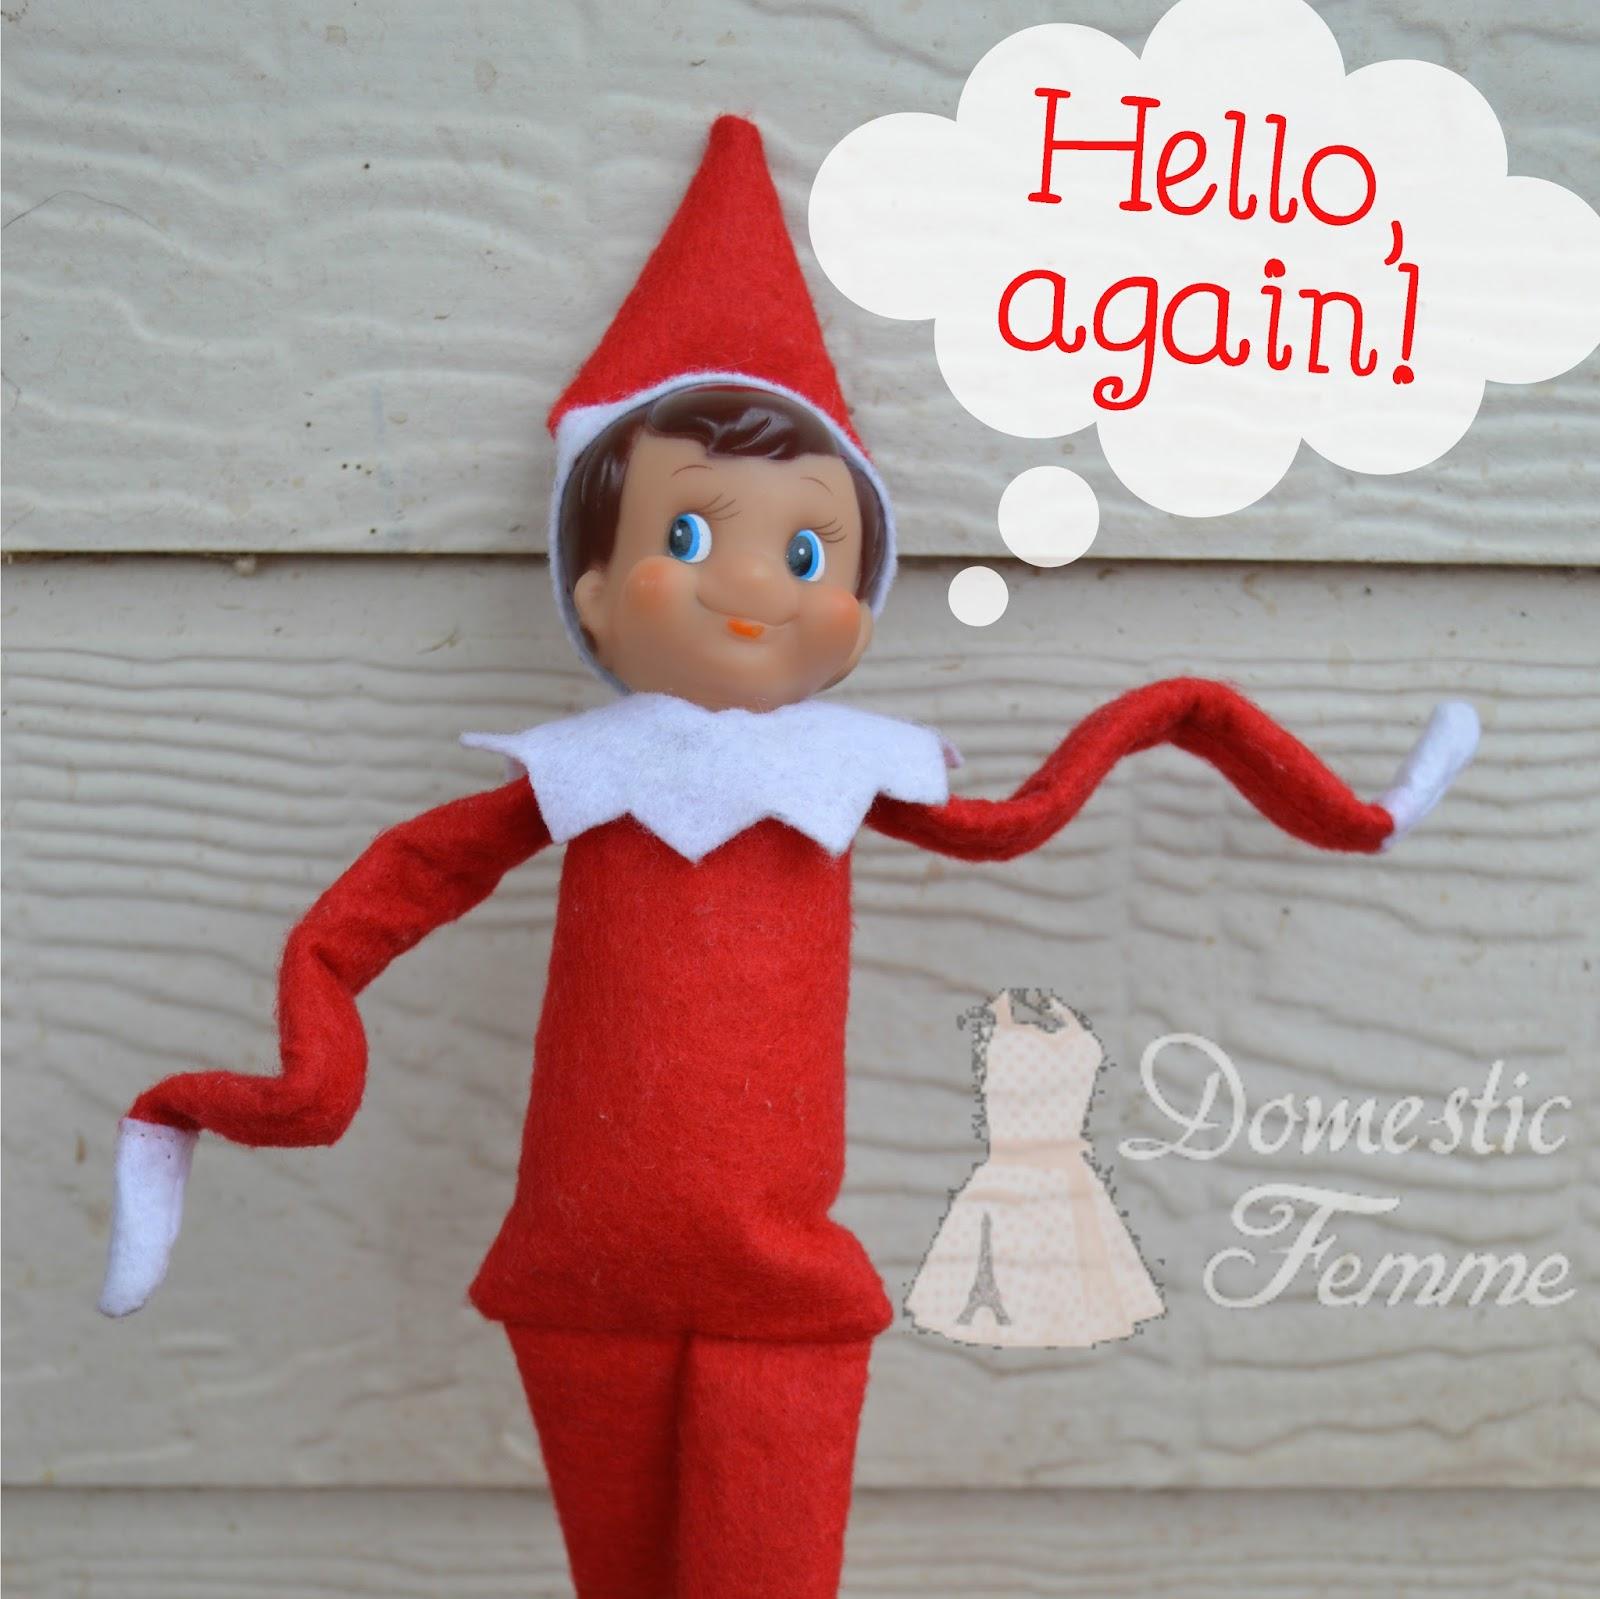 Domestic Femme Elf The Shelf Calendar with FREE